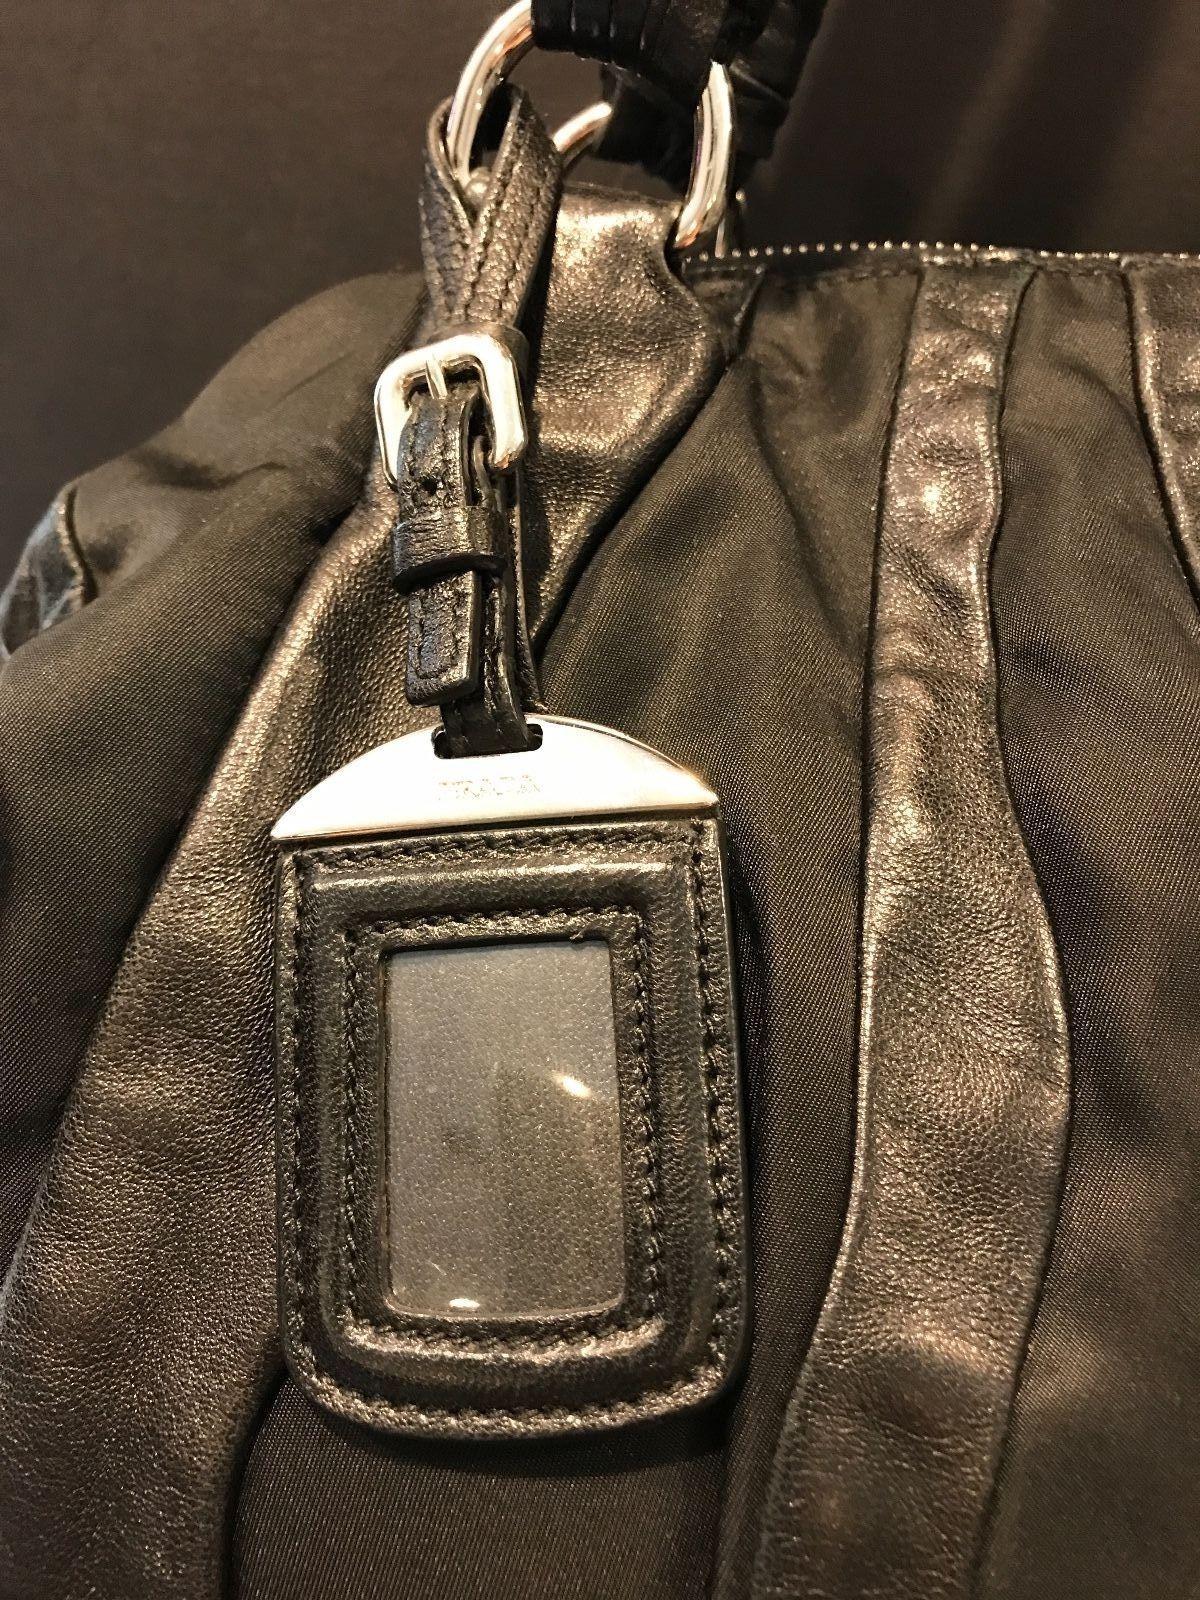 19fd485b4a14 Authentic Prada Black Nylon   Leather Bag! Beautiful!  650.0